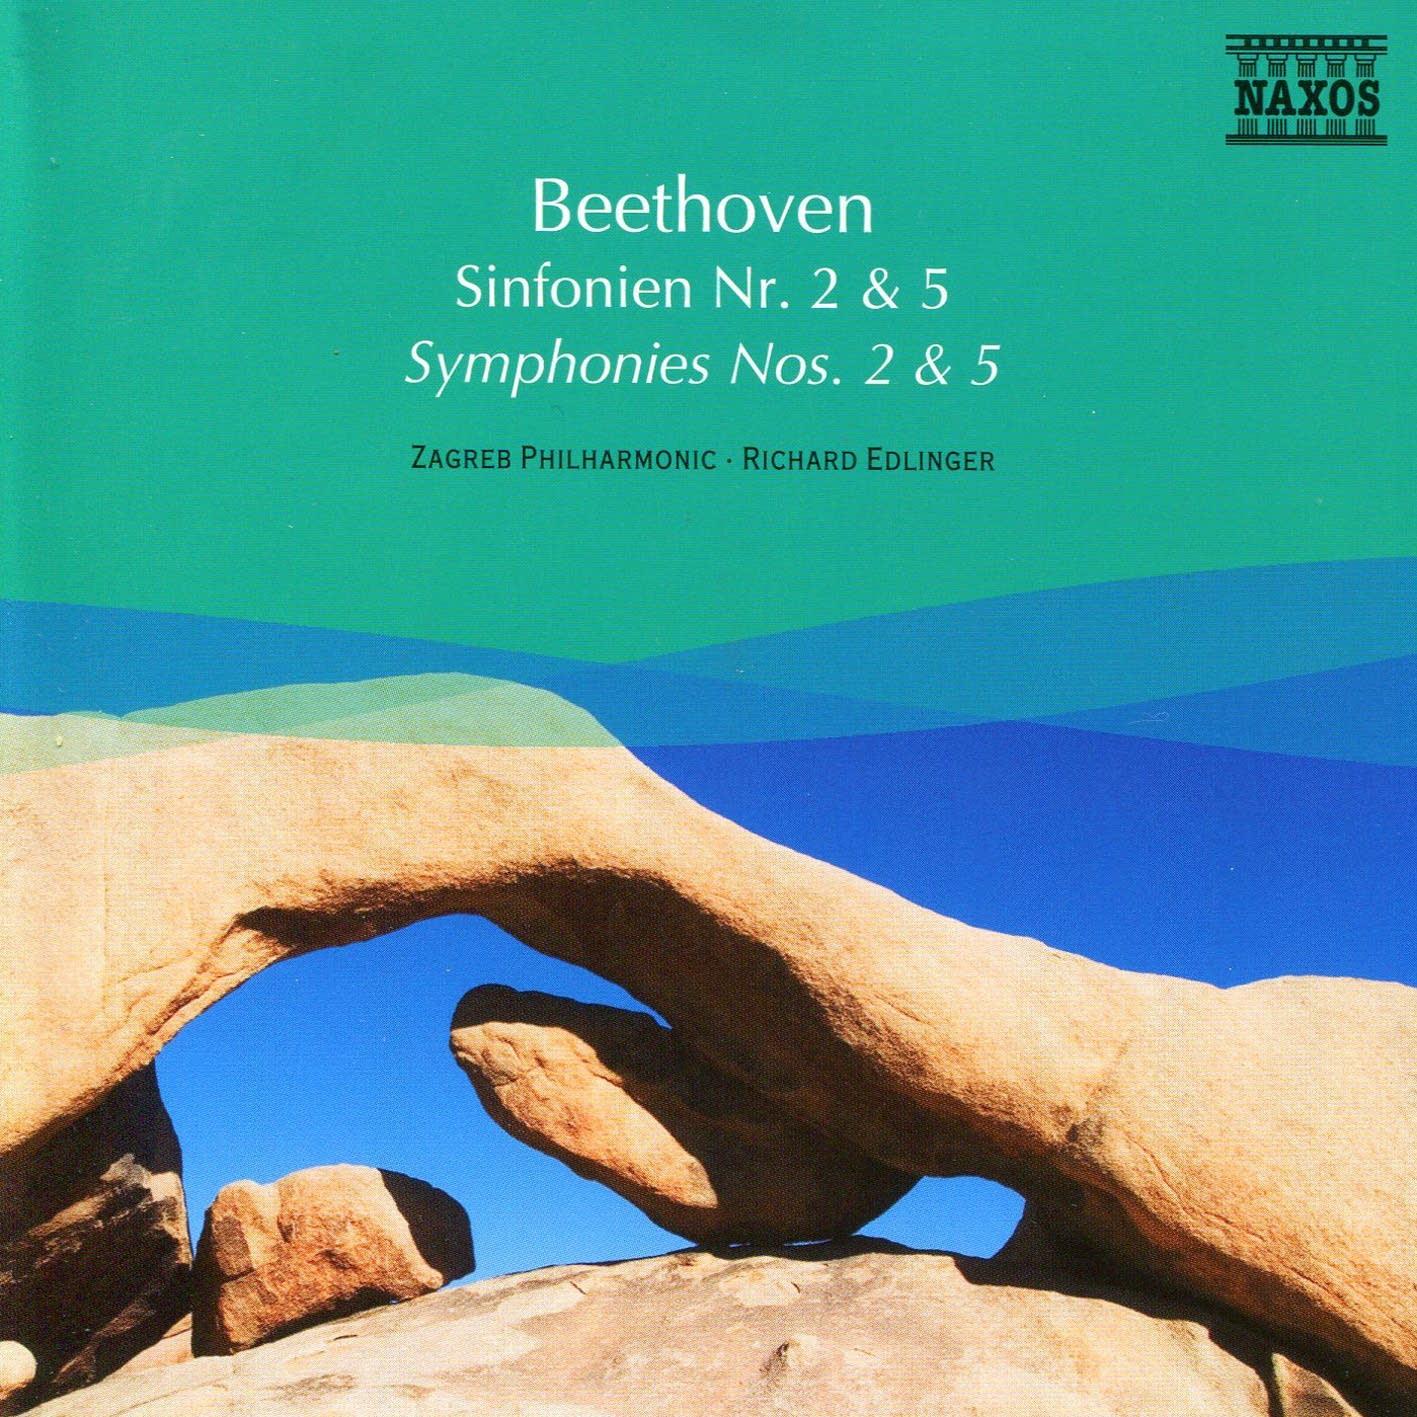 Ludwig van Beethoven - Symphony No. 5